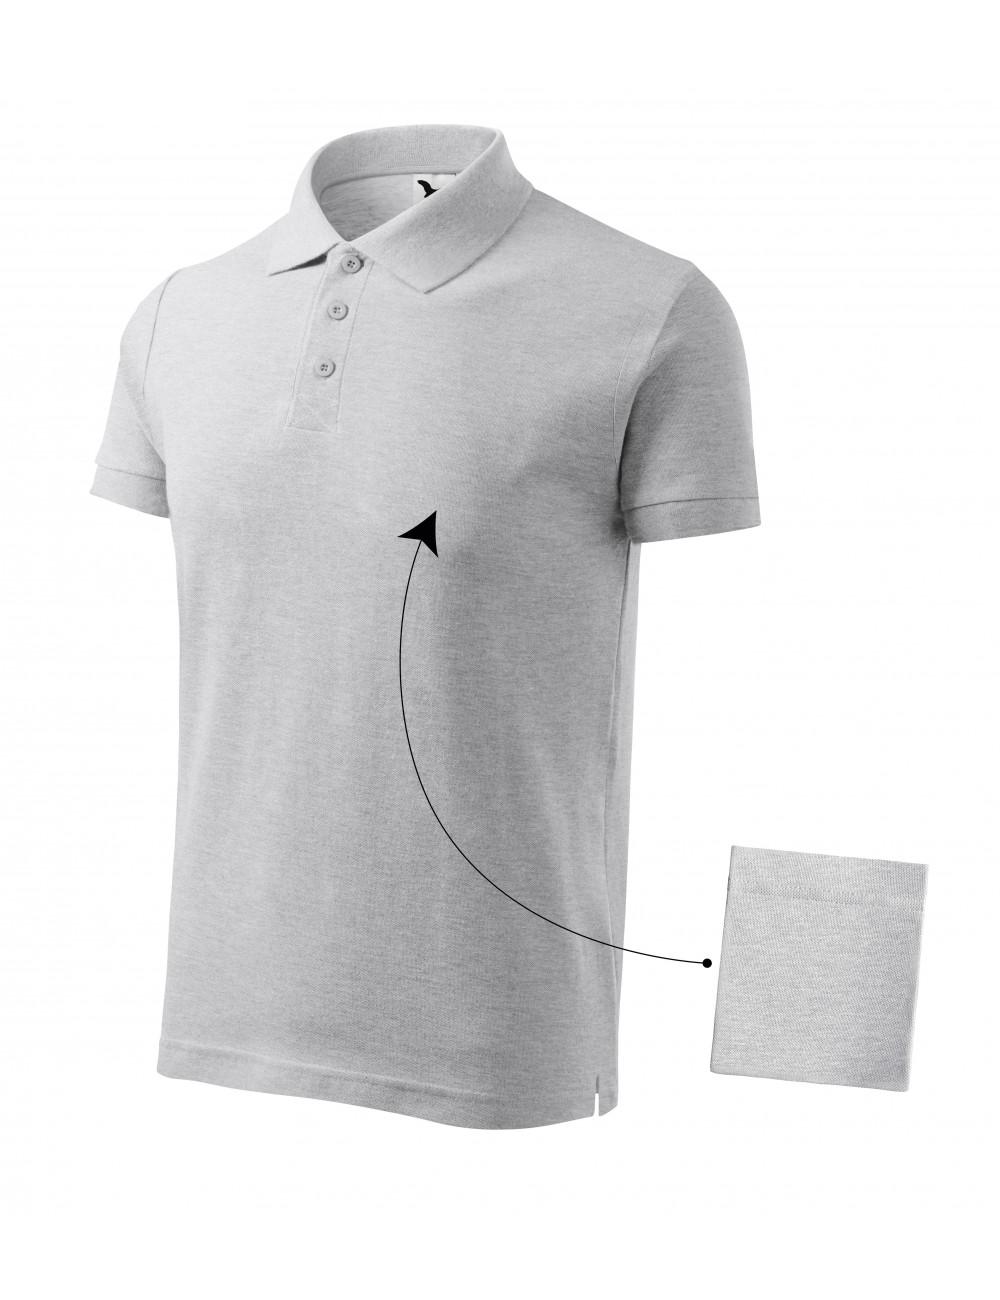 Adler MALFINI Koszulka polo męska Cotton 212 jasnoszary melanż